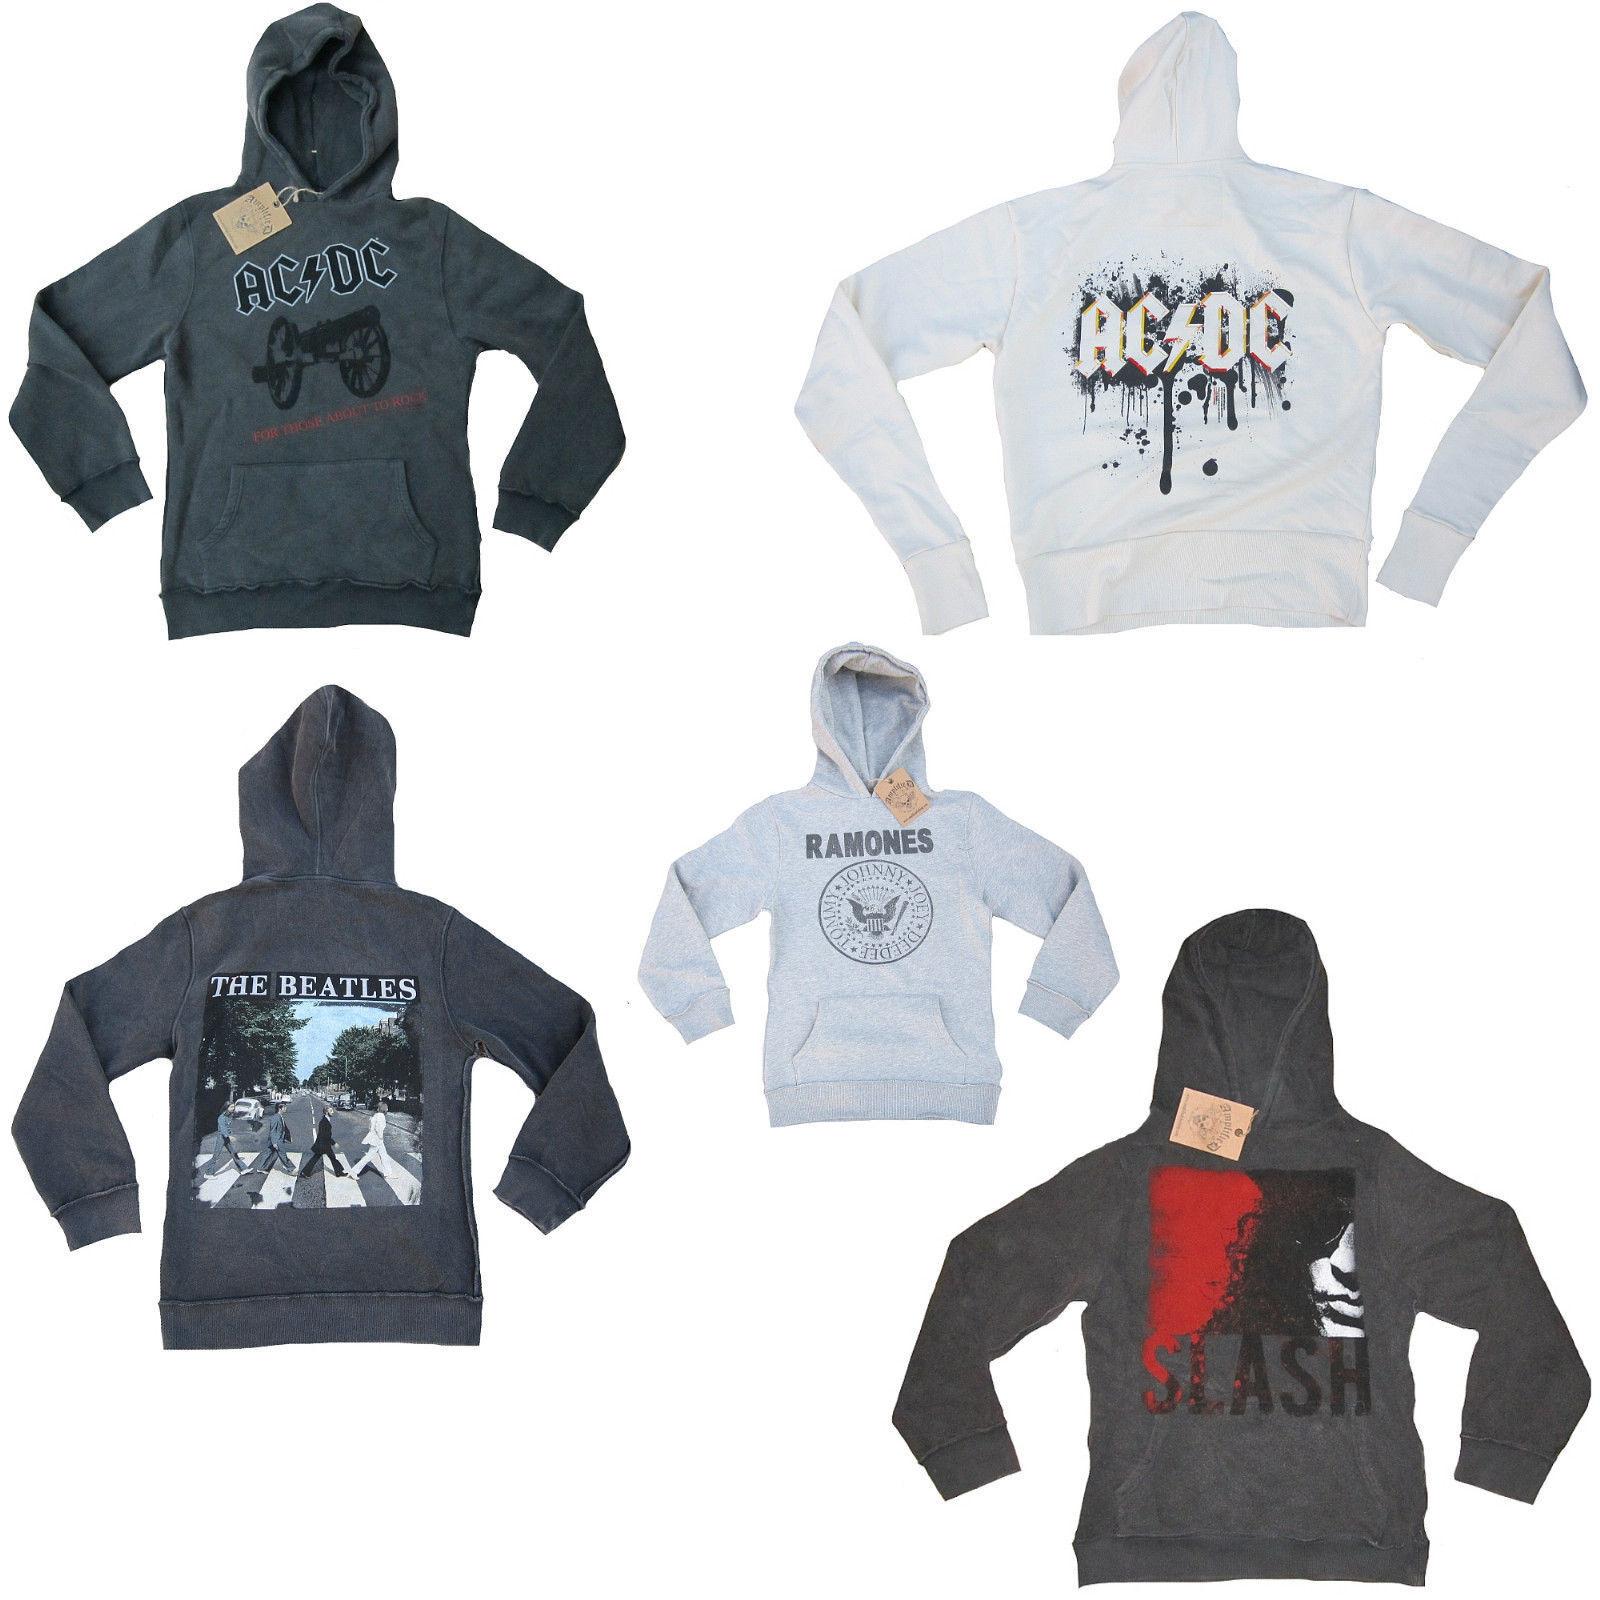 Amplified Official licence Felpa Hoodie Sweater Jumper Con Cappuccio Maglione WOW